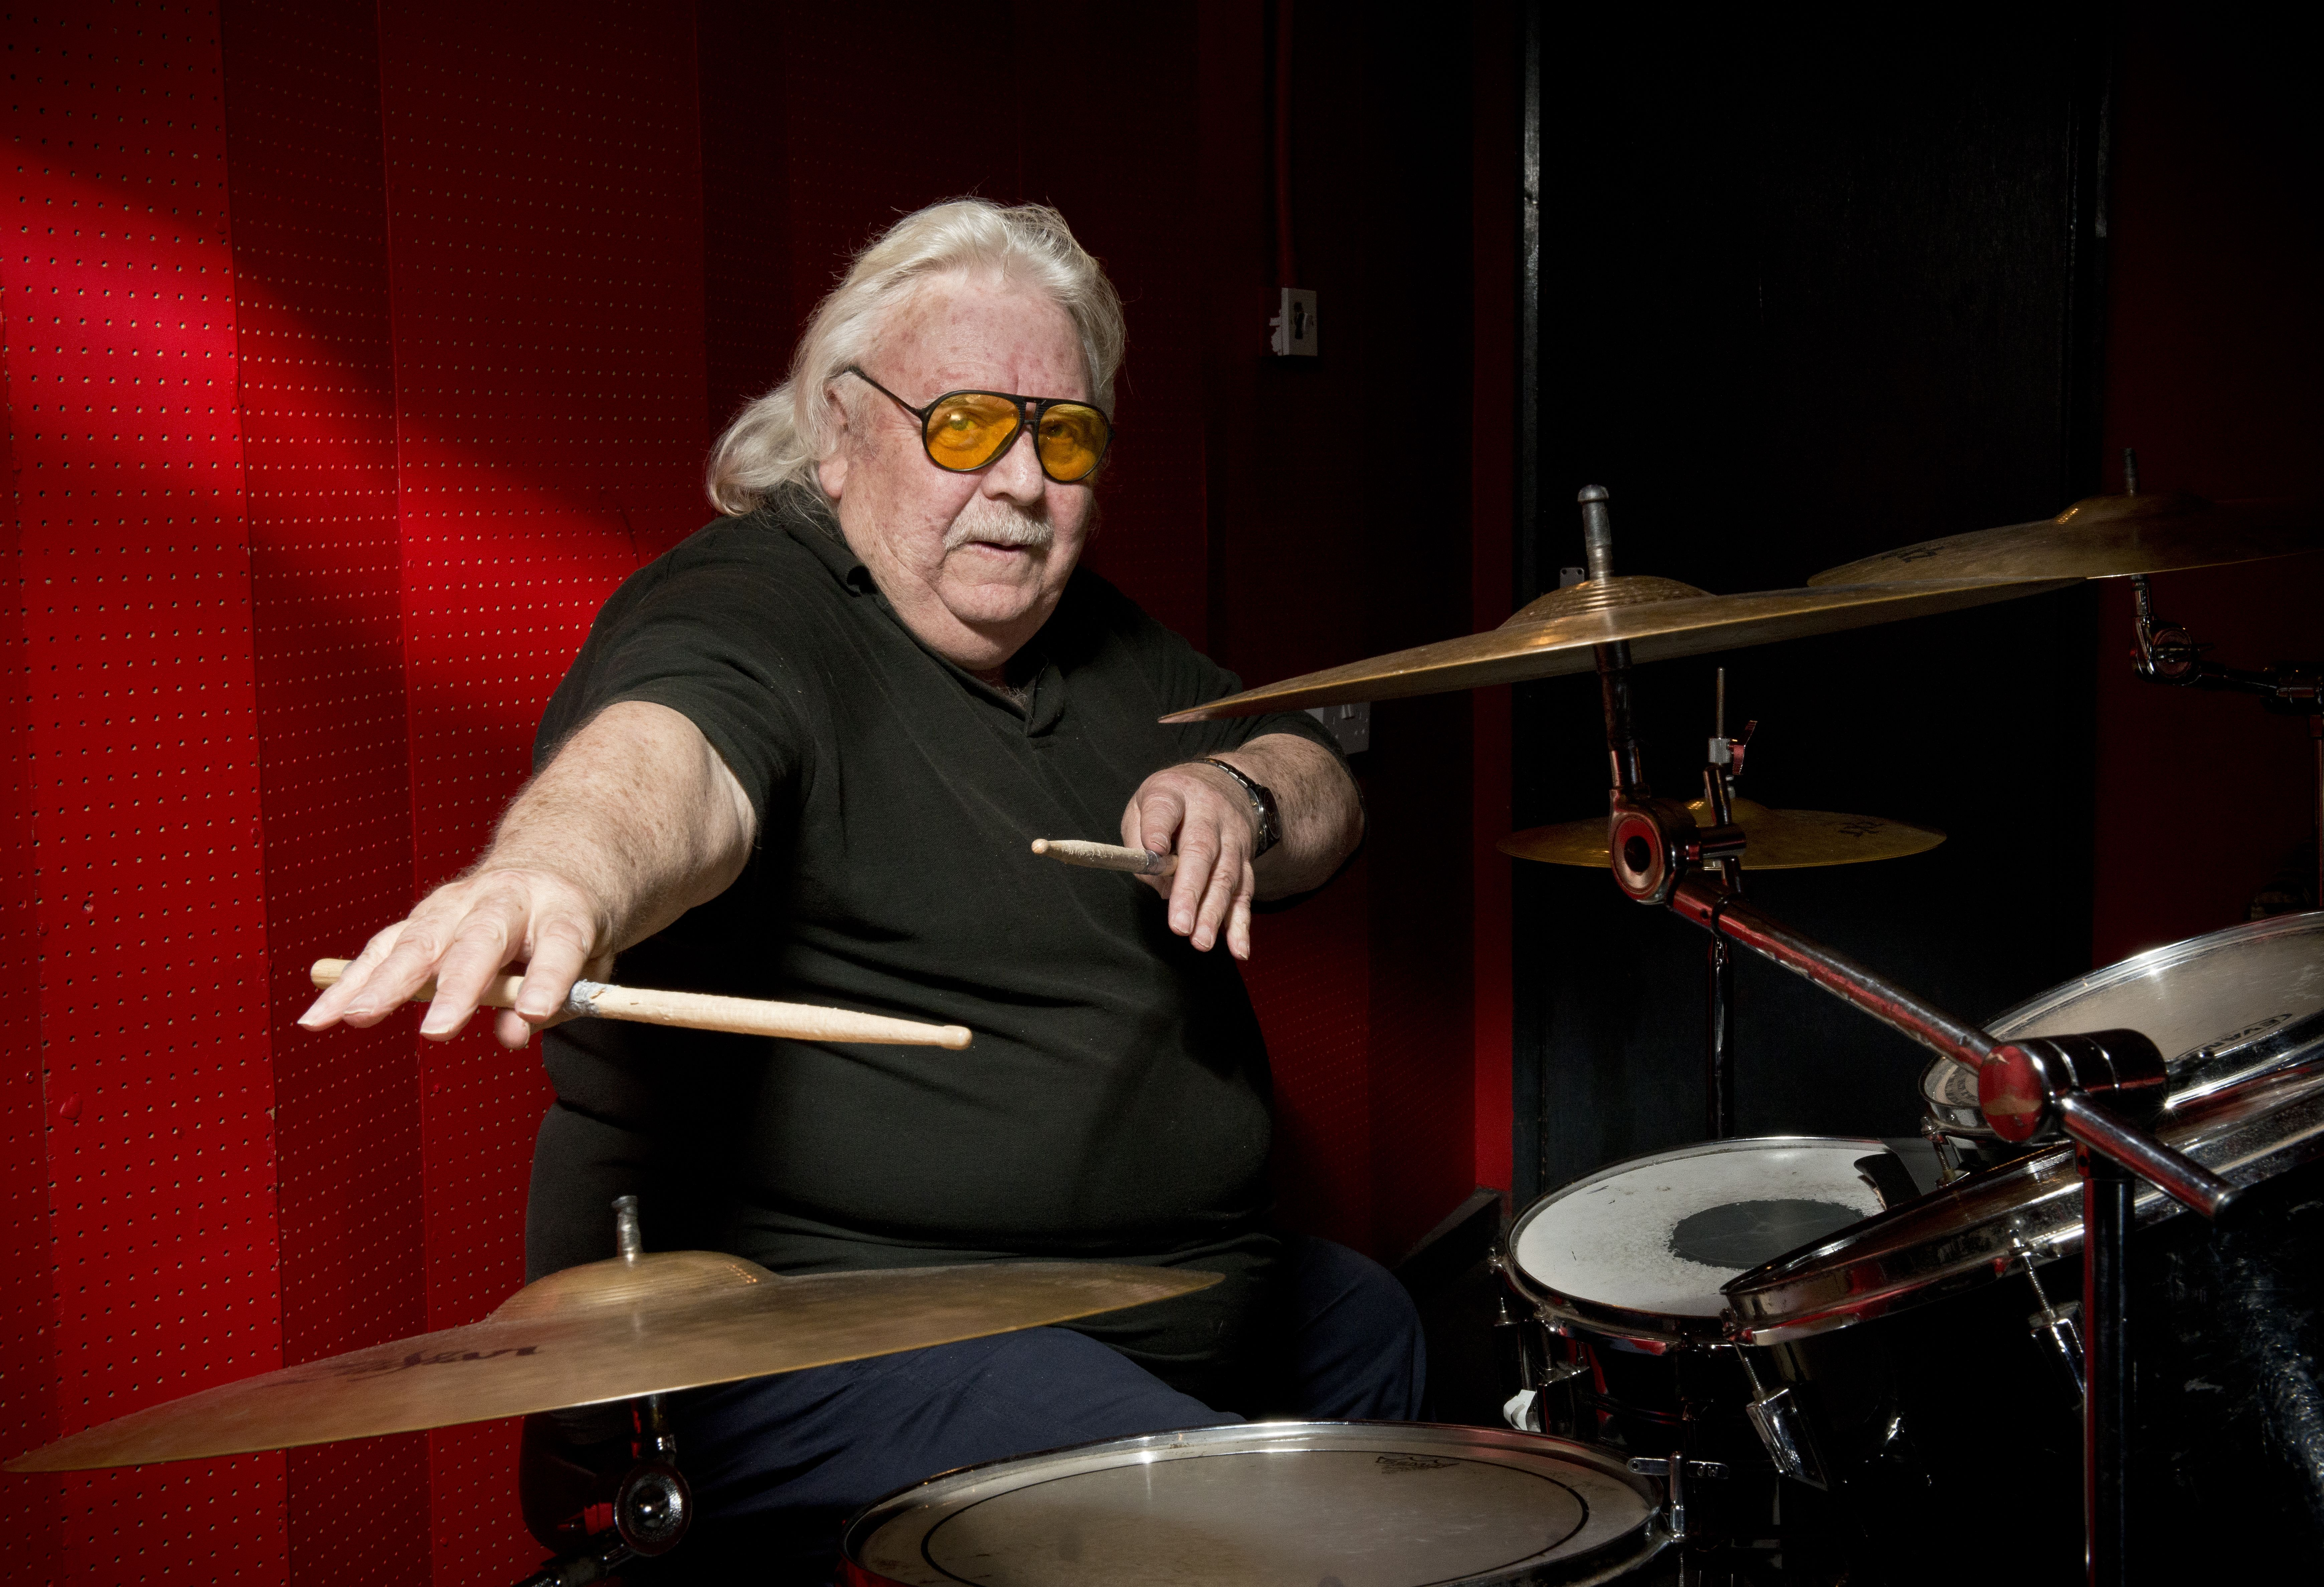 Terminally Ill Lee Kerslake Asks Ozzy Osbourne for Platinum Discs: 'It's on My Bucket List'